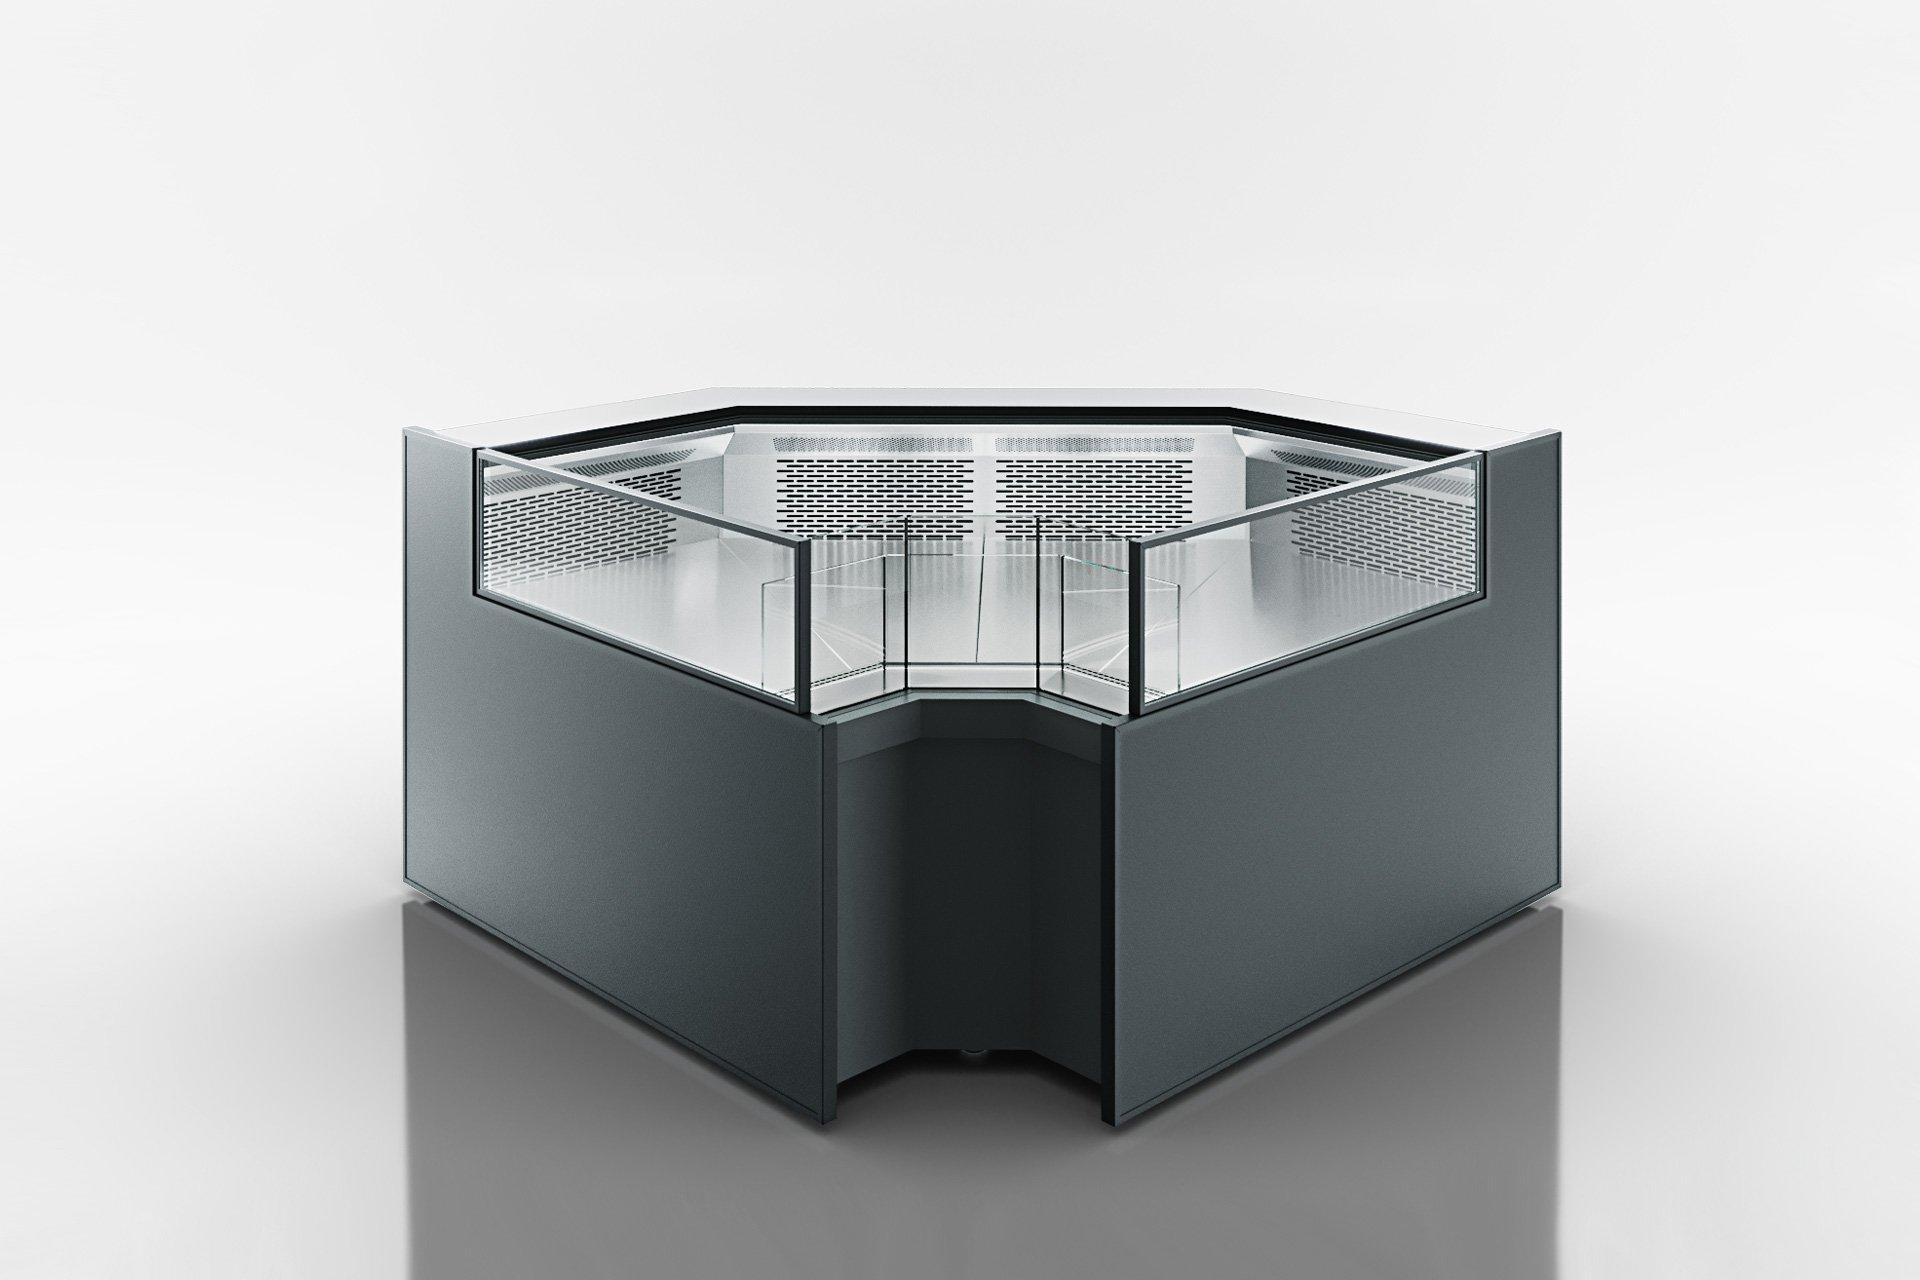 Angular elements of refrigerating counters Missouri MC 120 deli self 086-DLM-IS90